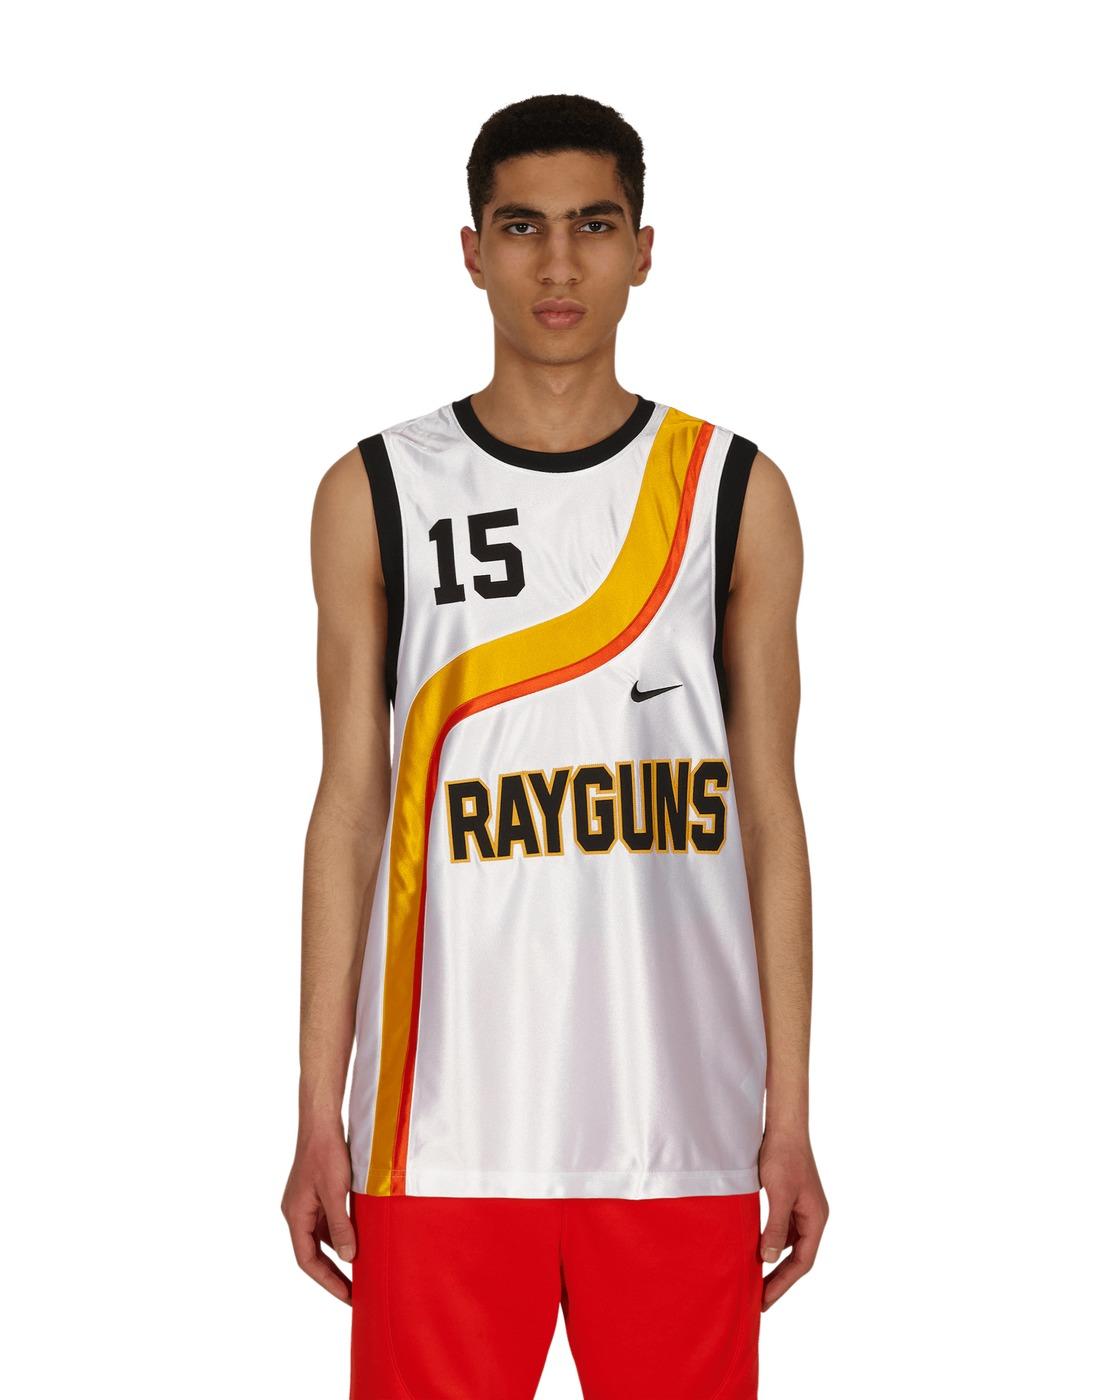 Photo: Nike Jordan Rayguns Jersey White/University Gold